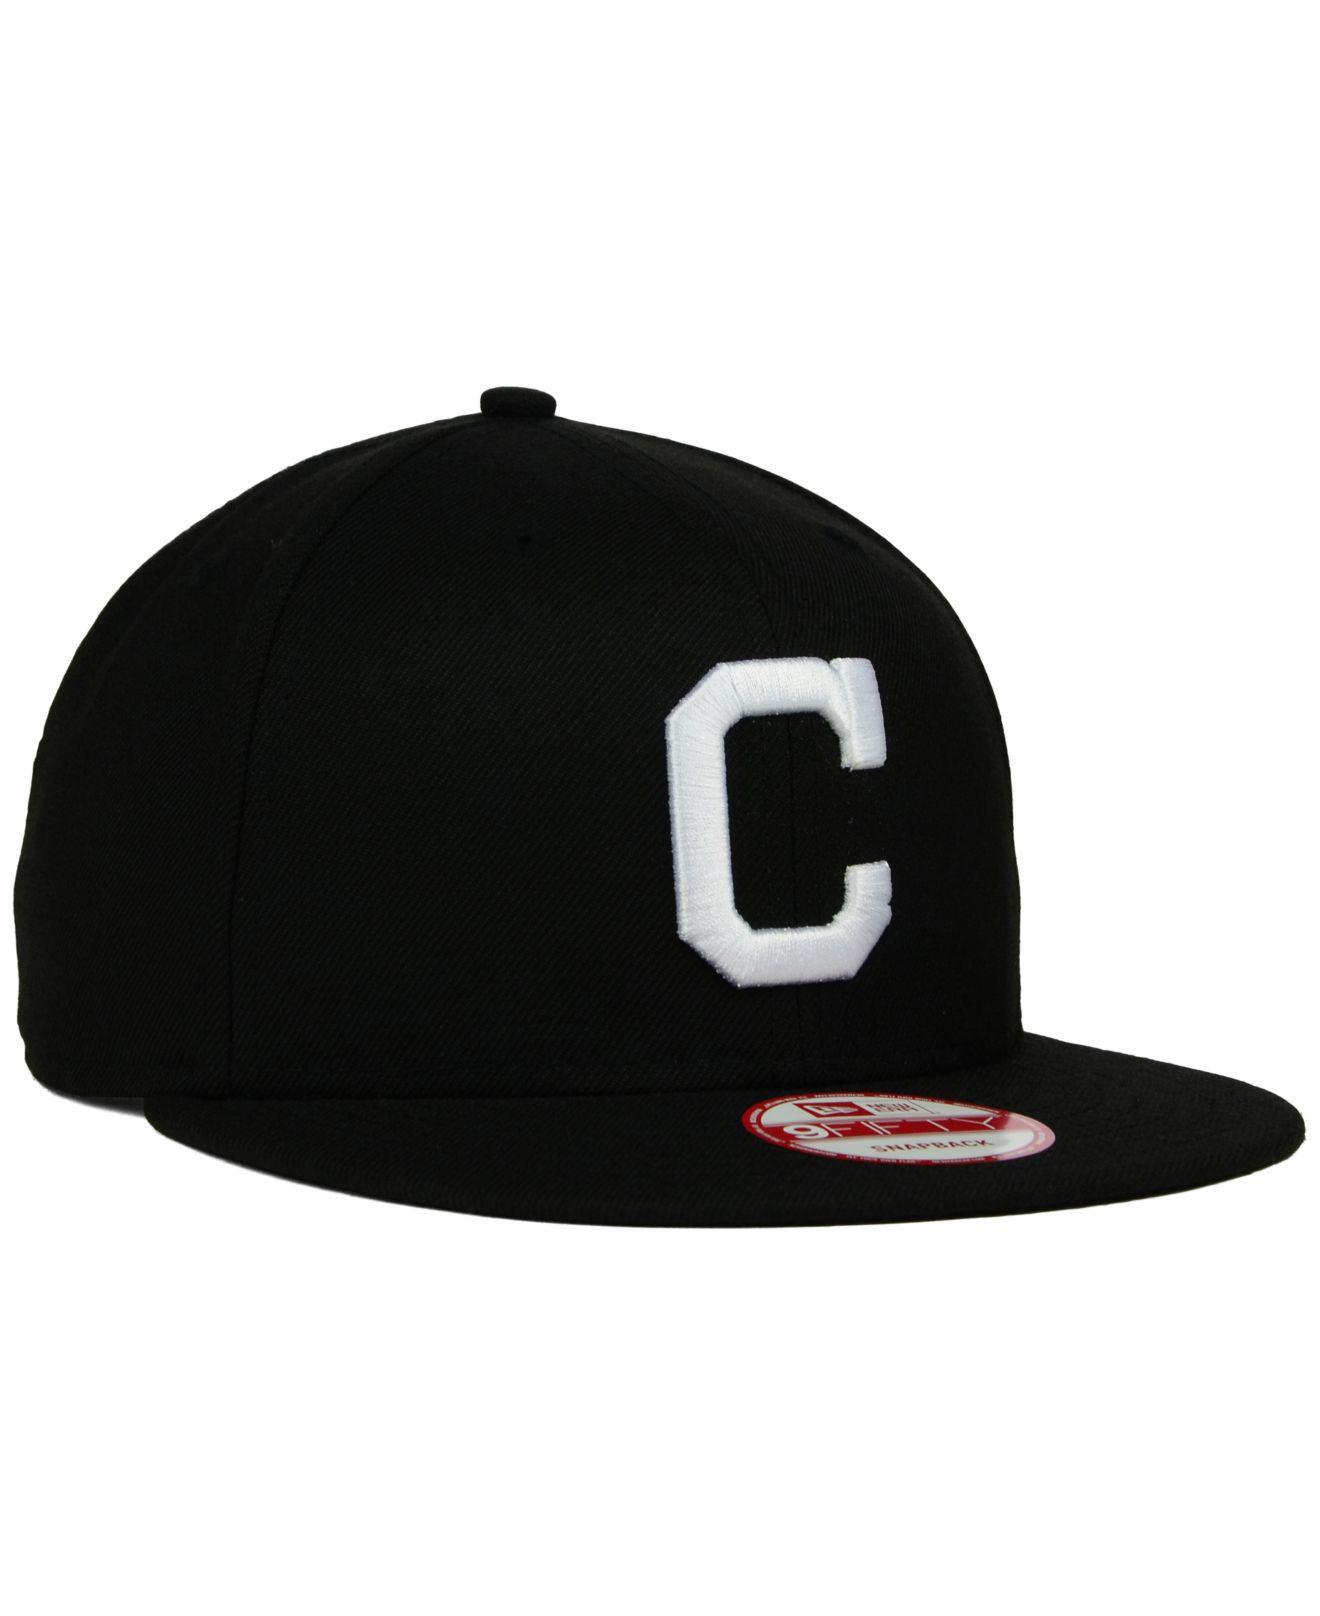 new product e355f dff5e ... closeout cleveland indians b dub 9fifty snapback cap for men lyst. view  fullscreen a0031 6f0f9